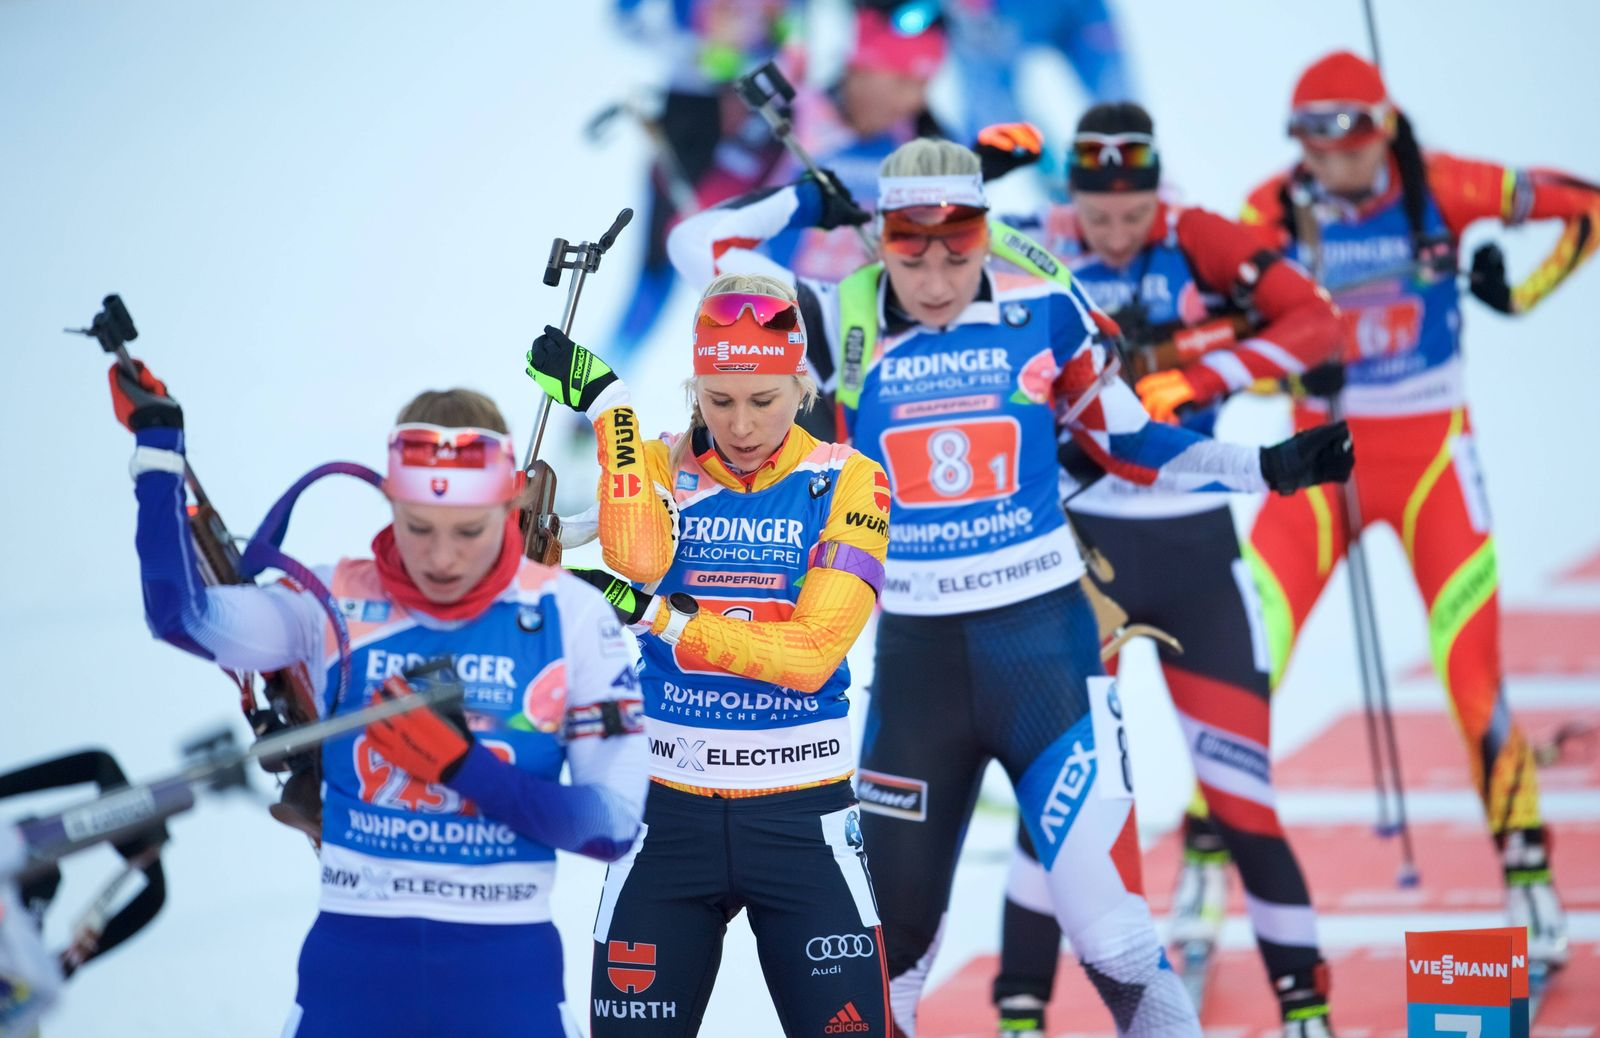 Biathlon Ruhpolding / GER 17.01.2020 IBU Worldcup Cup Woman /Frauen/ Damen STAFFEL 4 x 6 km HORCHLER Karolin GER *** Bi